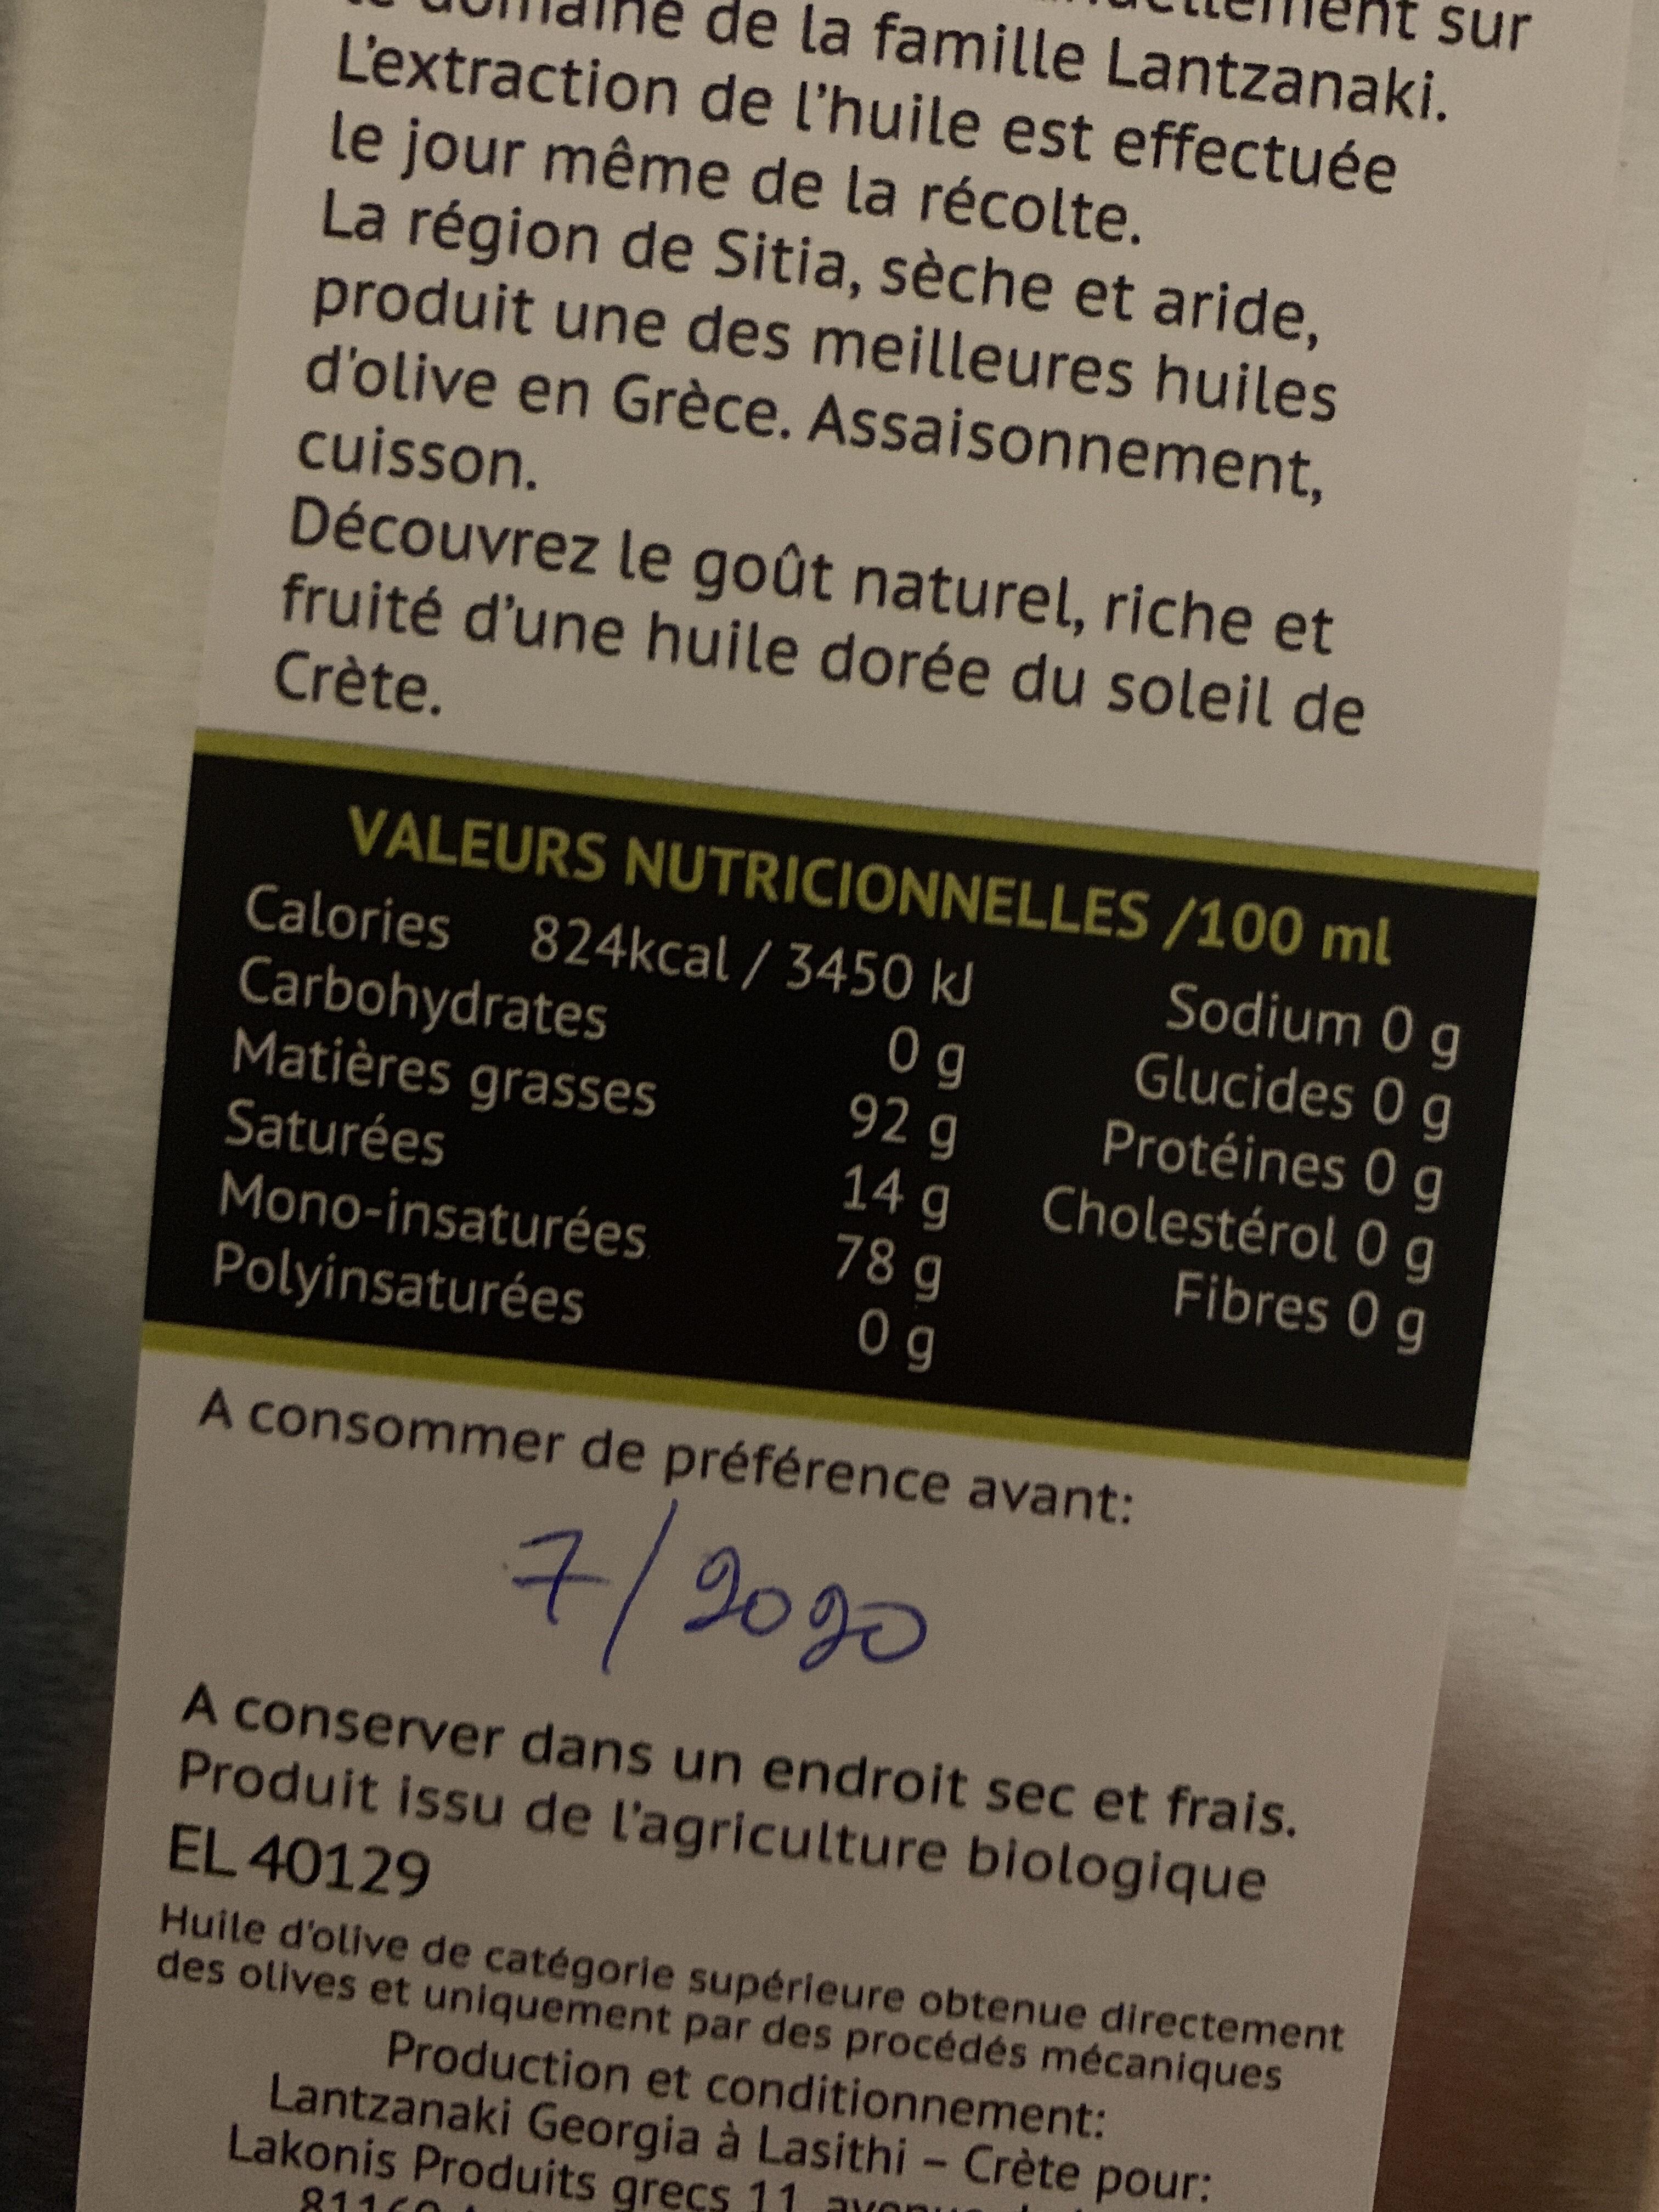 Lakonis Ariane domaine Lantzanaki - Informations nutritionnelles - fr